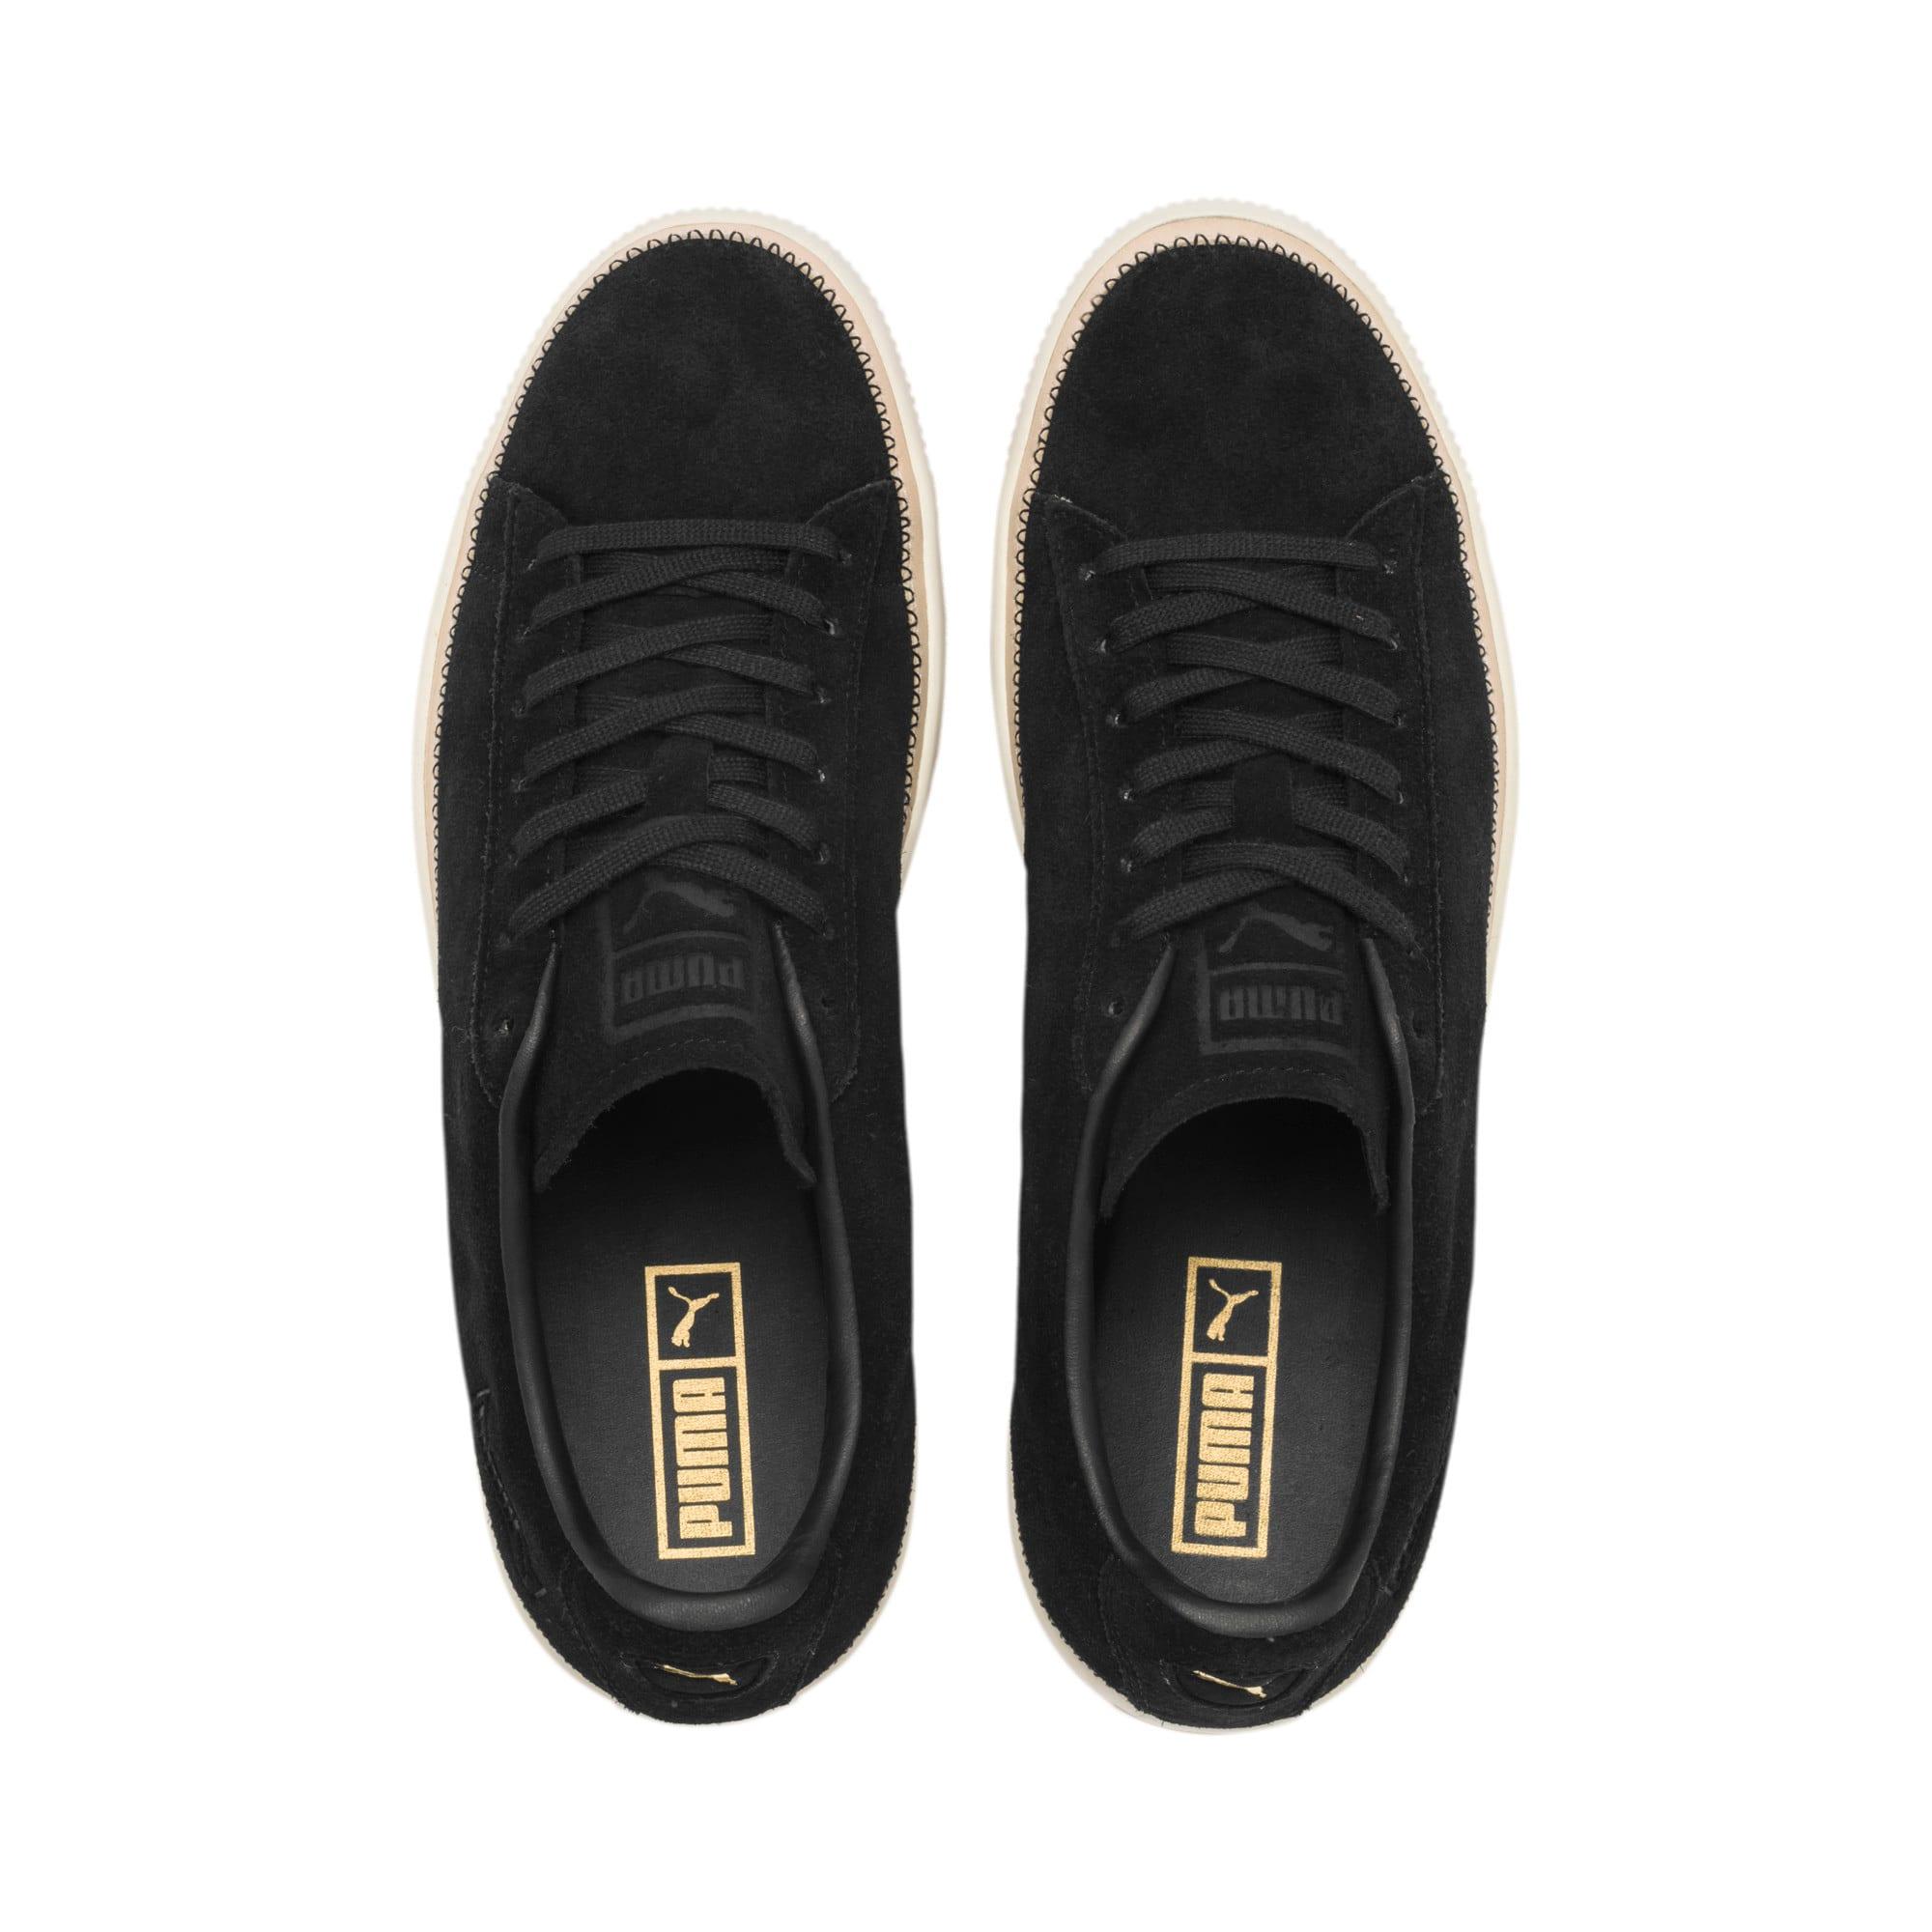 Thumbnail 7 of Suede Trim PRM Sneakers, Puma Black-Whisper White, medium